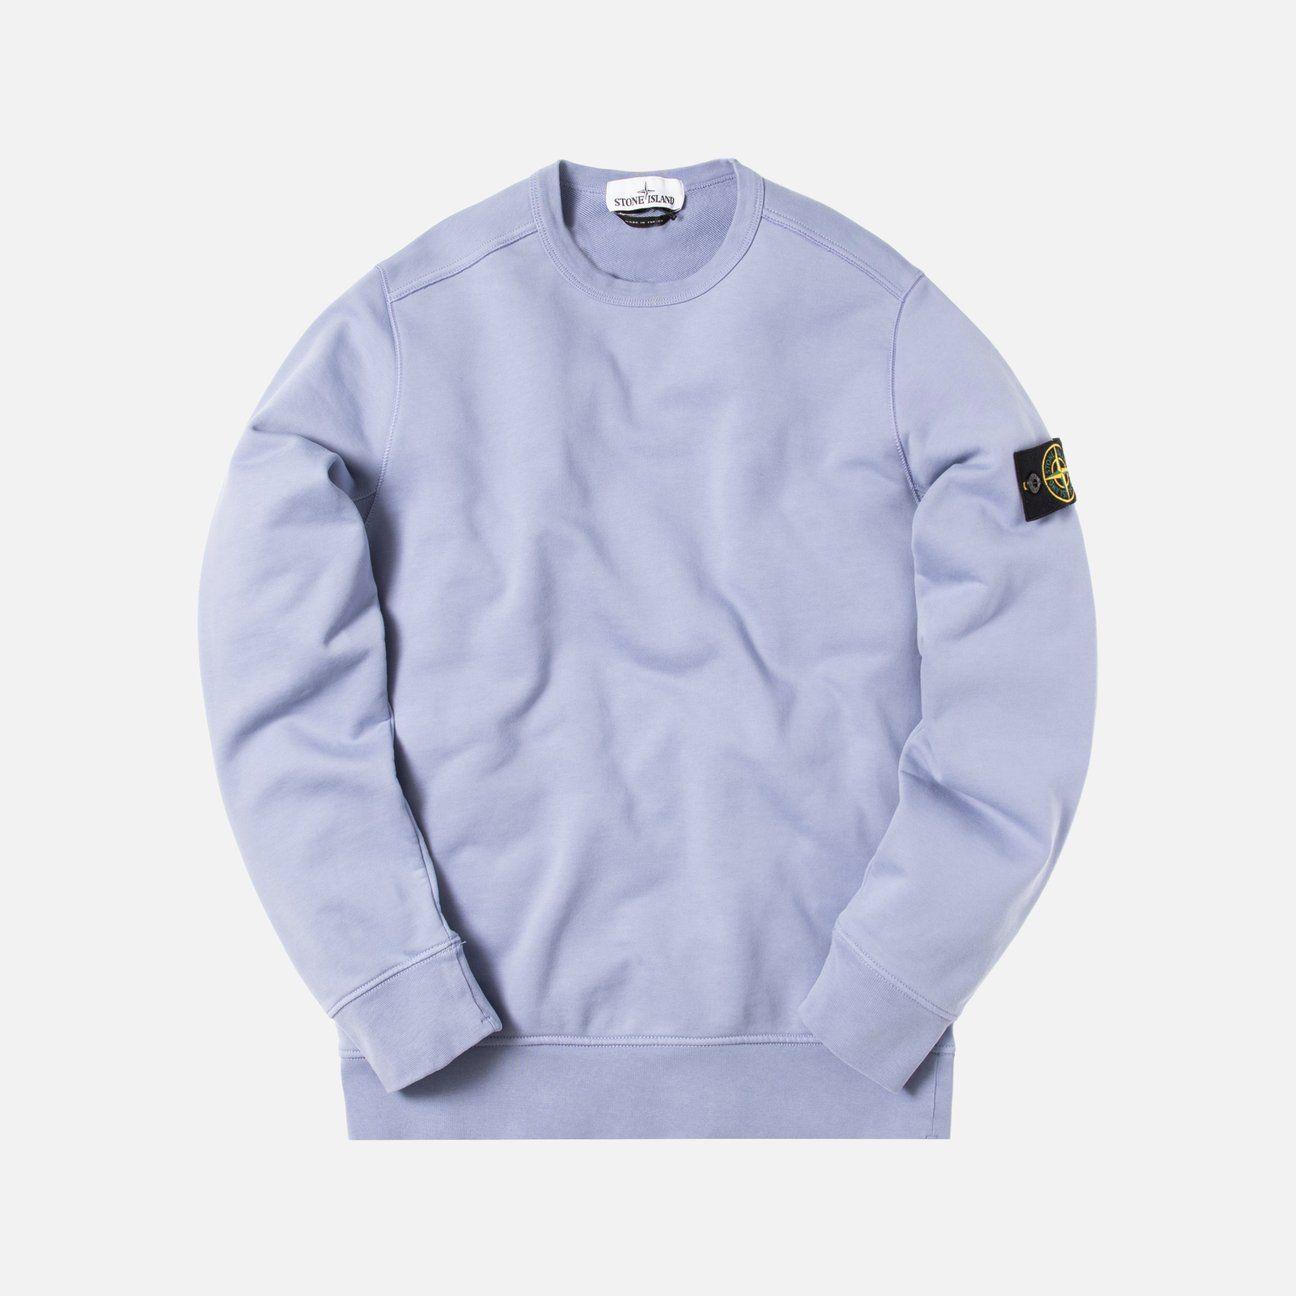 Stone Island Fleece Garment Dyed Crewneck Lavender Kith Garment Dye Garment Stone Island [ 1296 x 1296 Pixel ]